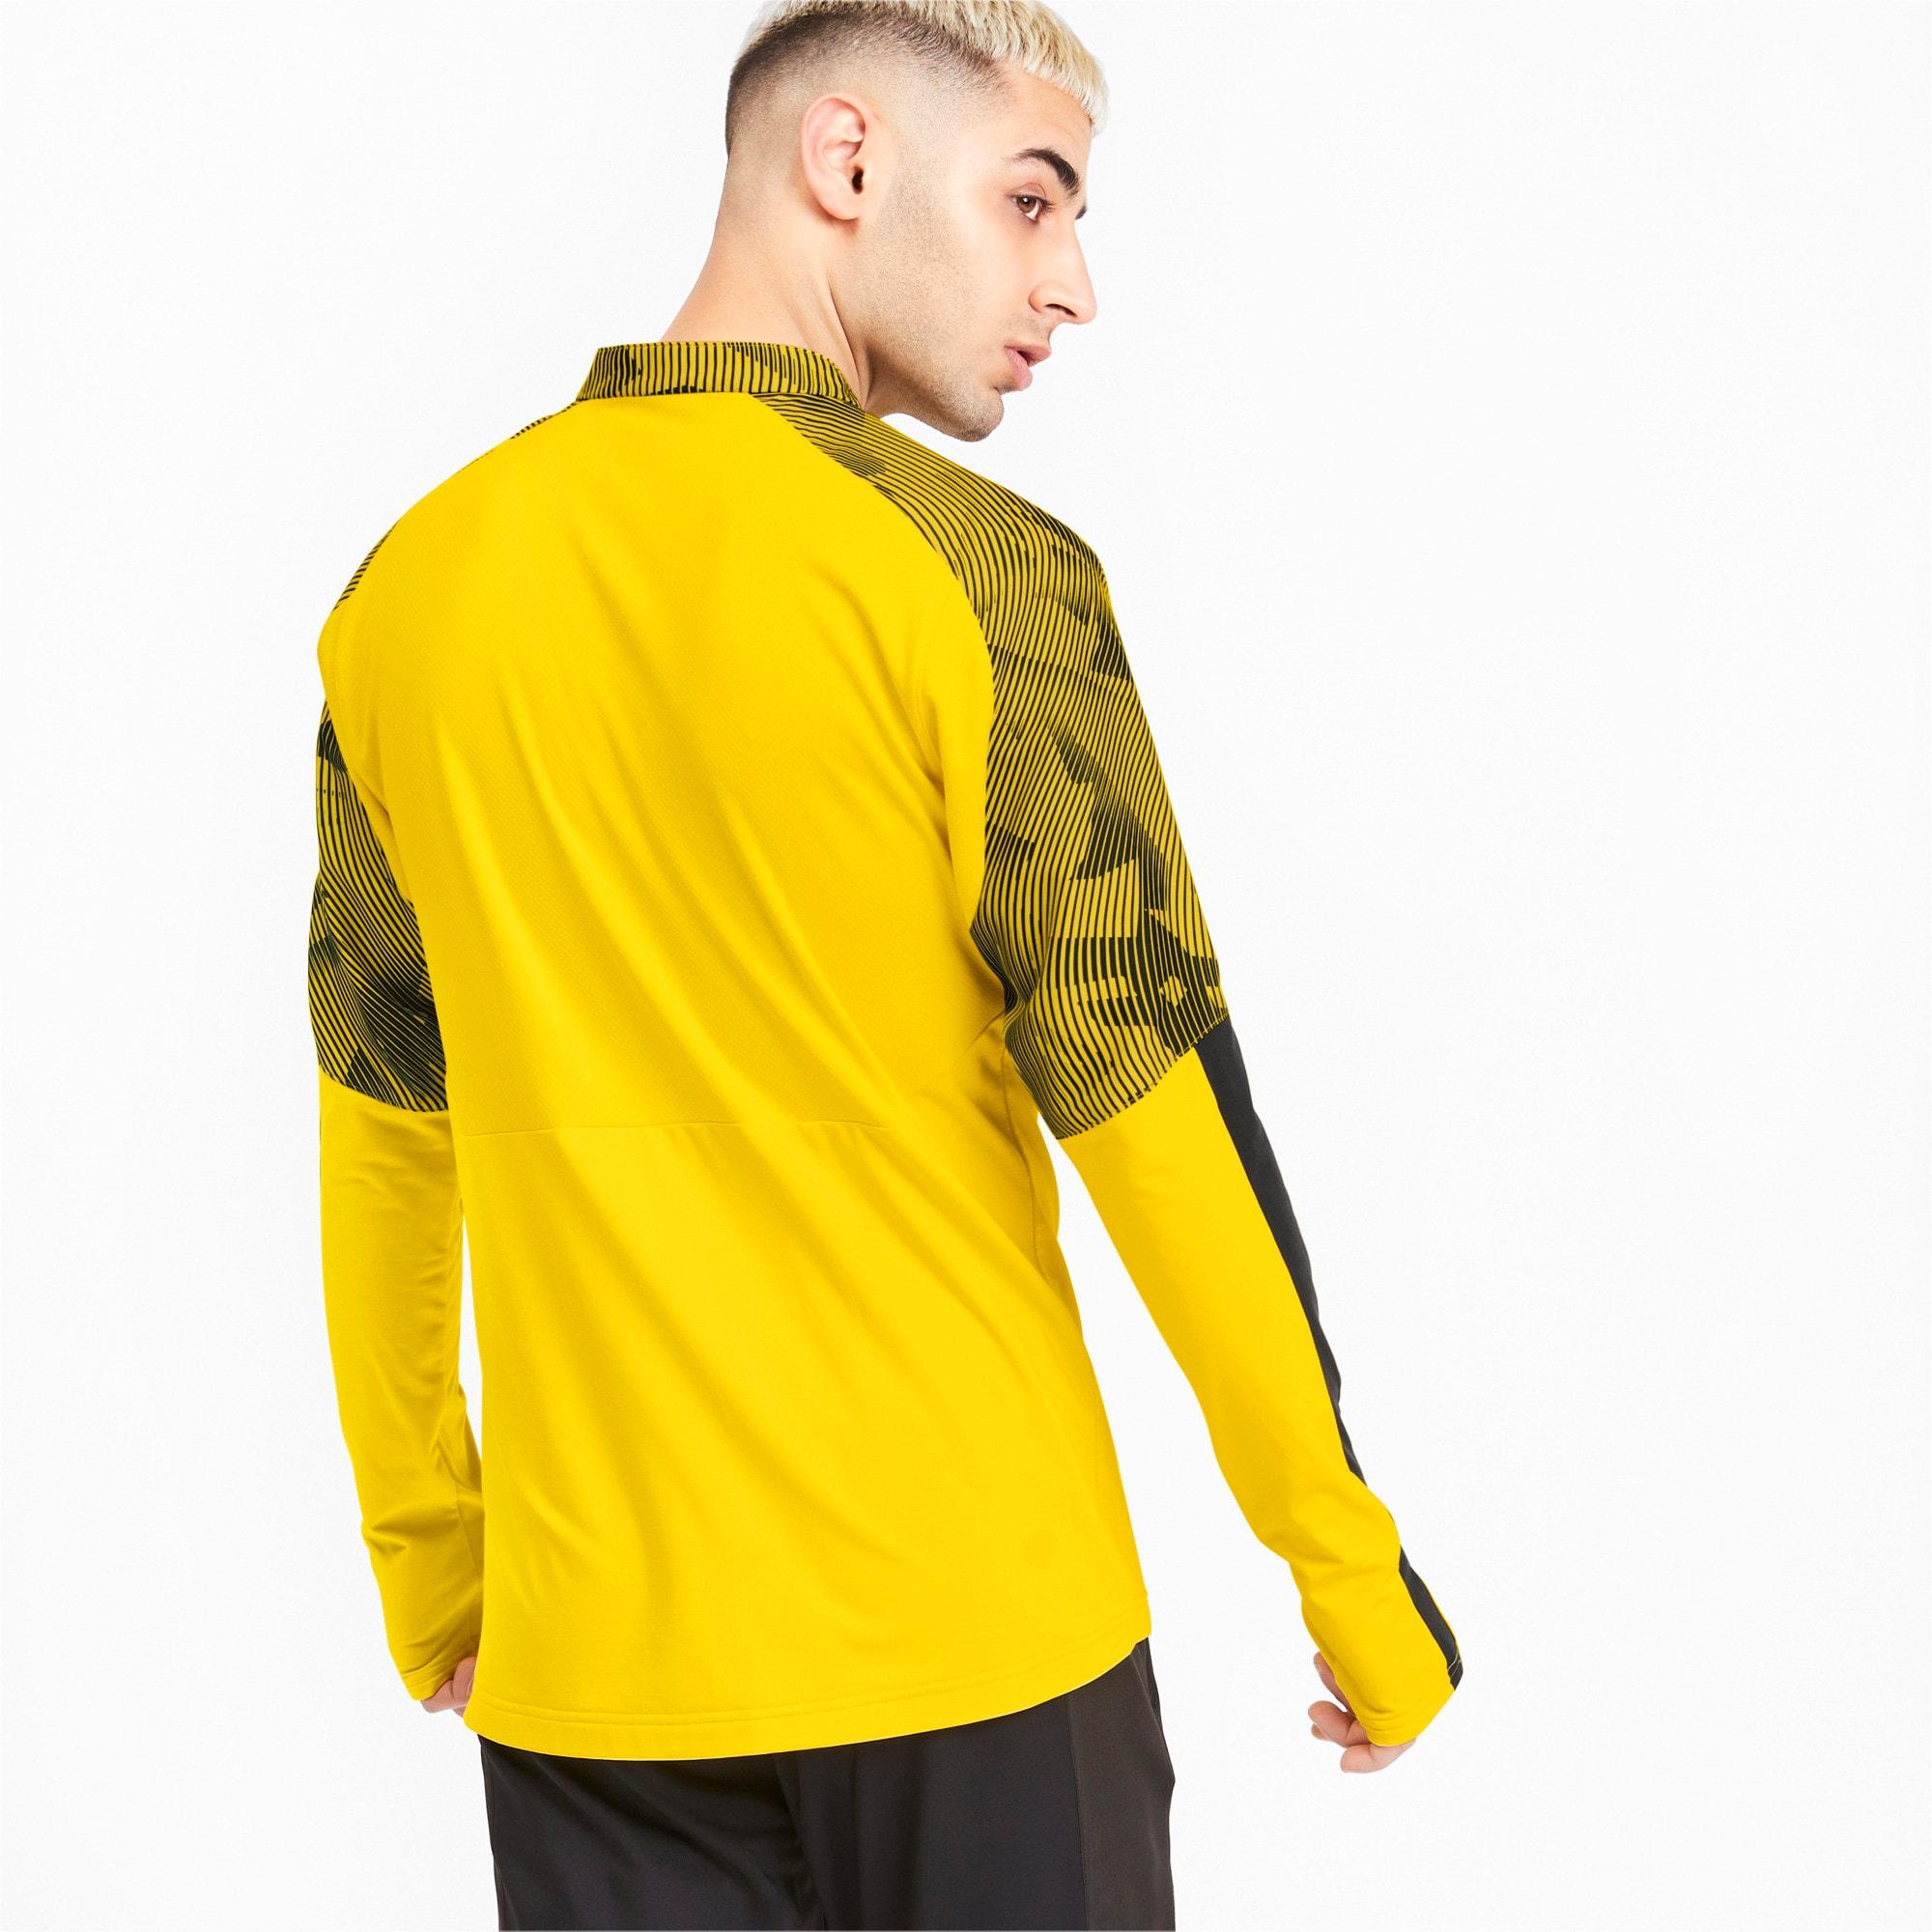 Thumbnail 2 of BVB Quarter Zip Men's Training Top, Cyber Yellow-Puma Black, medium